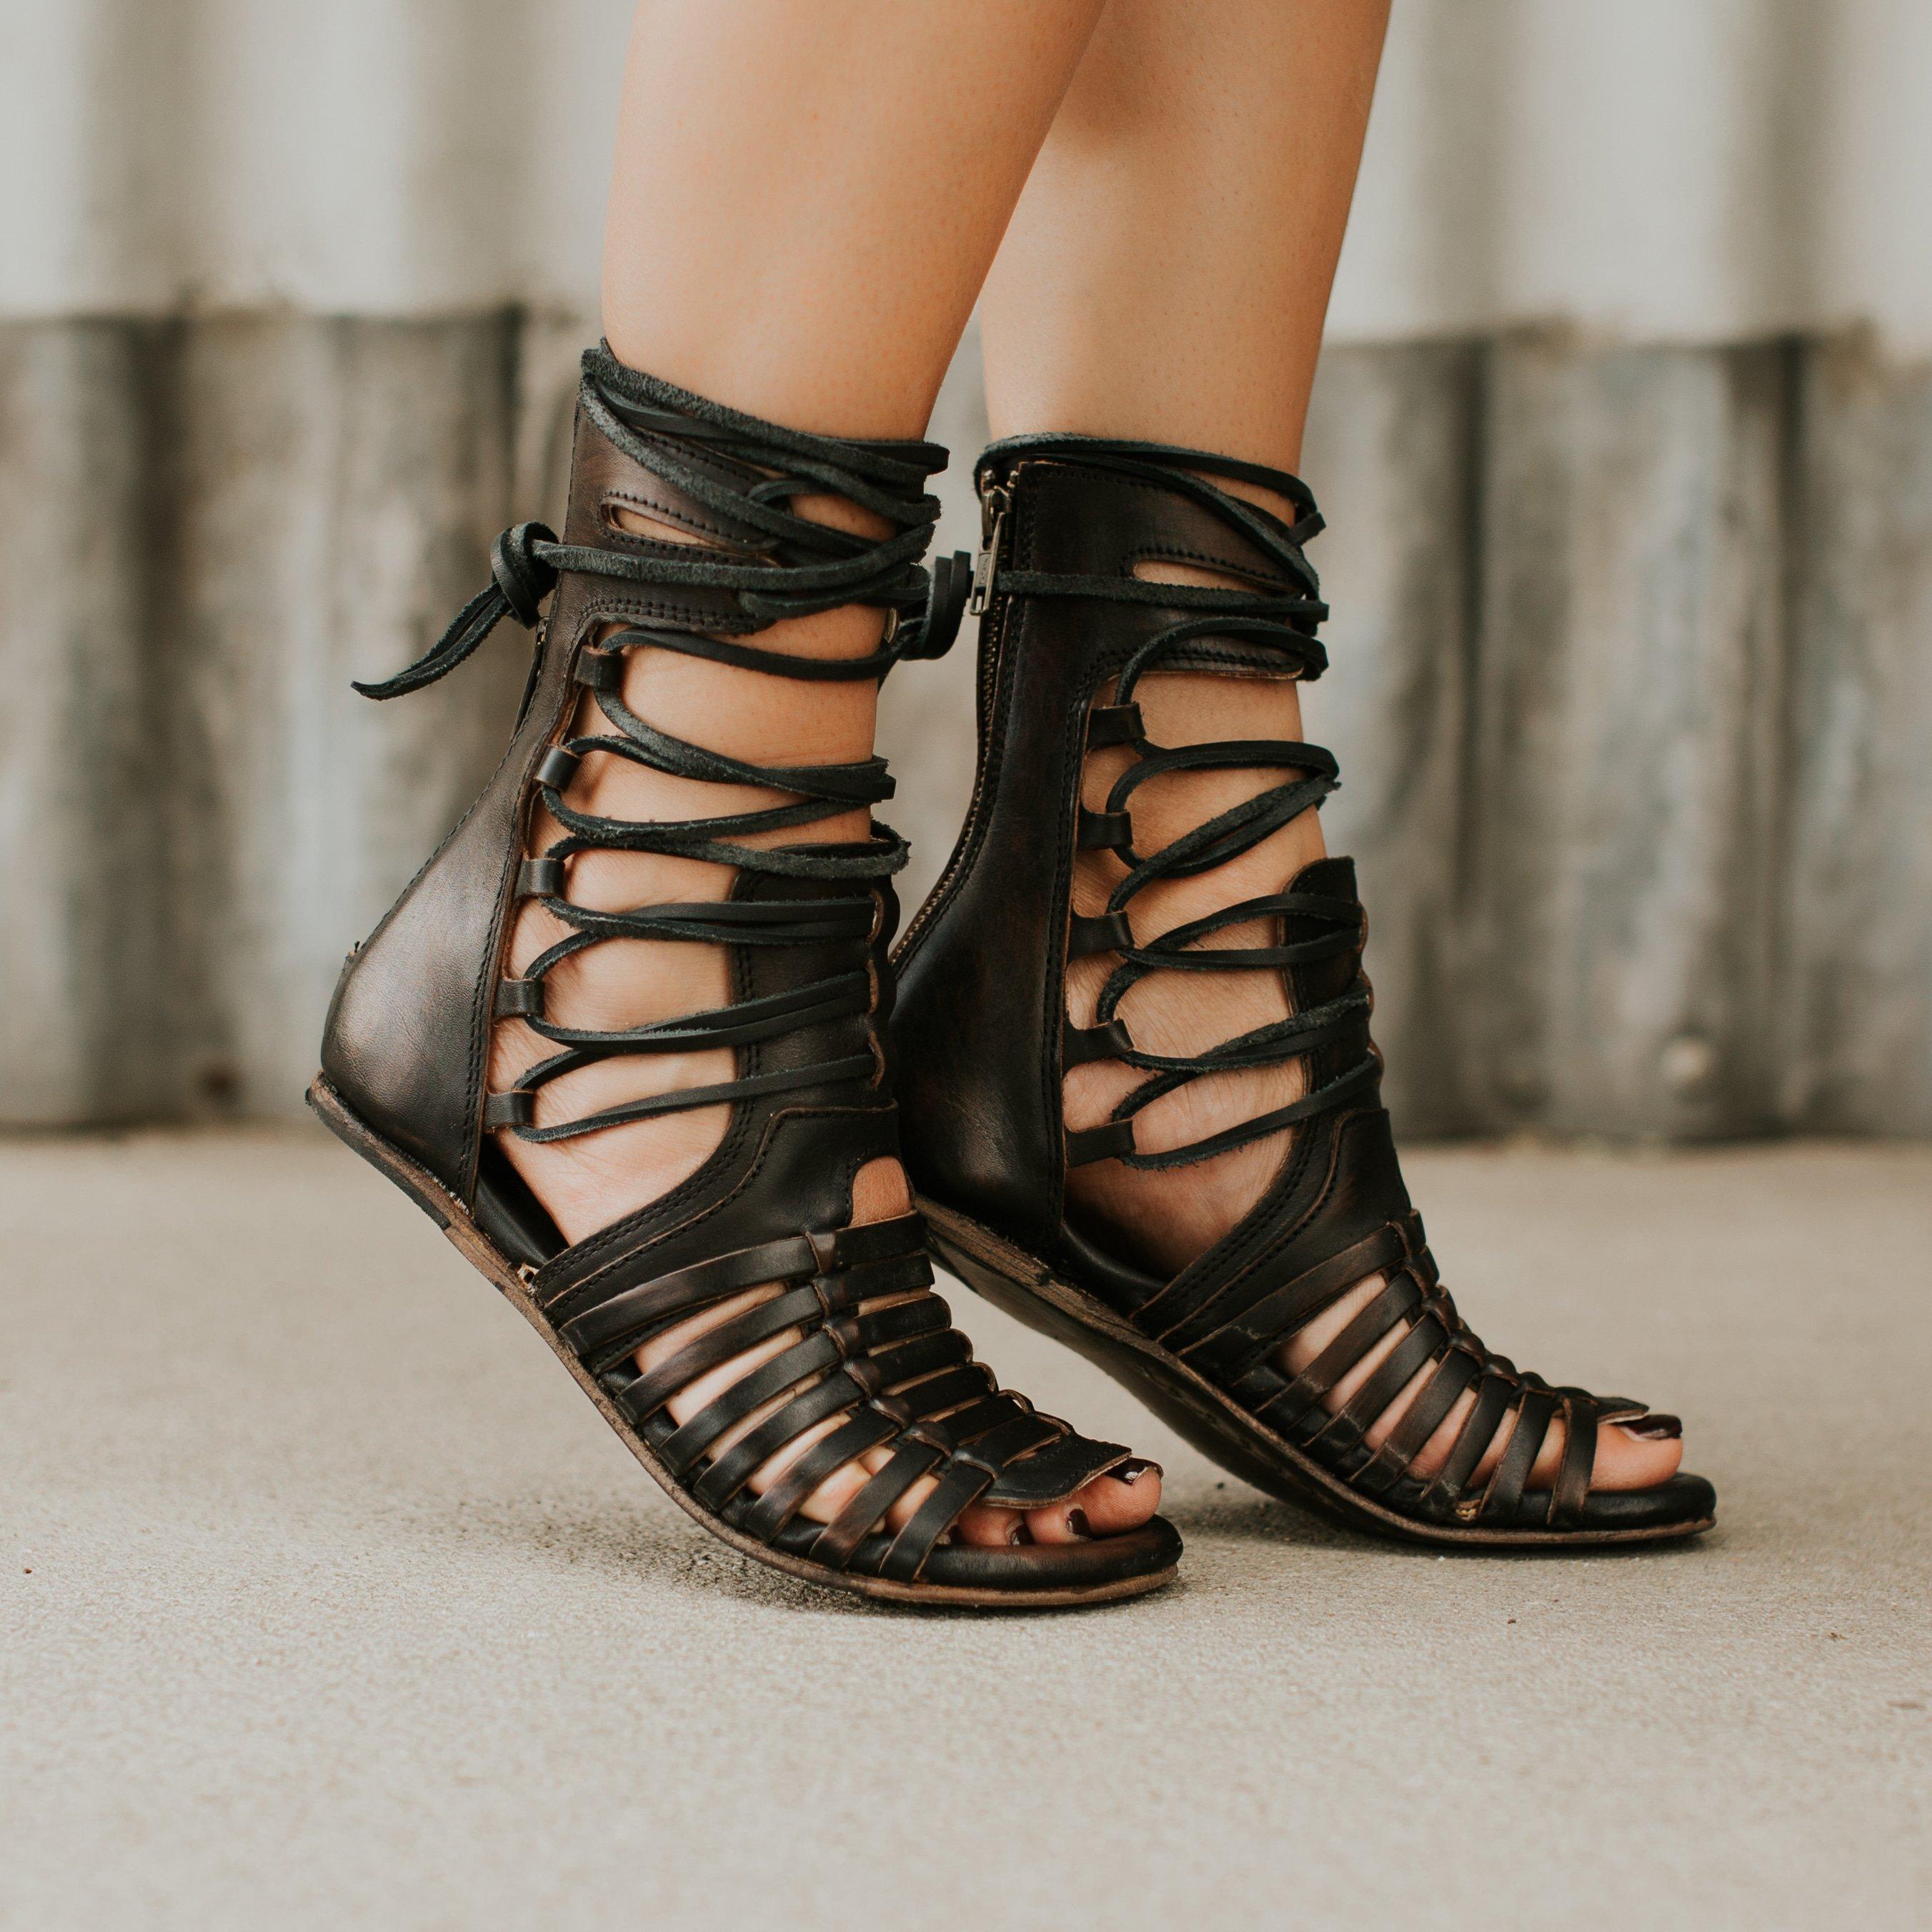 a8cd22cbe612 Sanibel Flat Gladiator Sandals